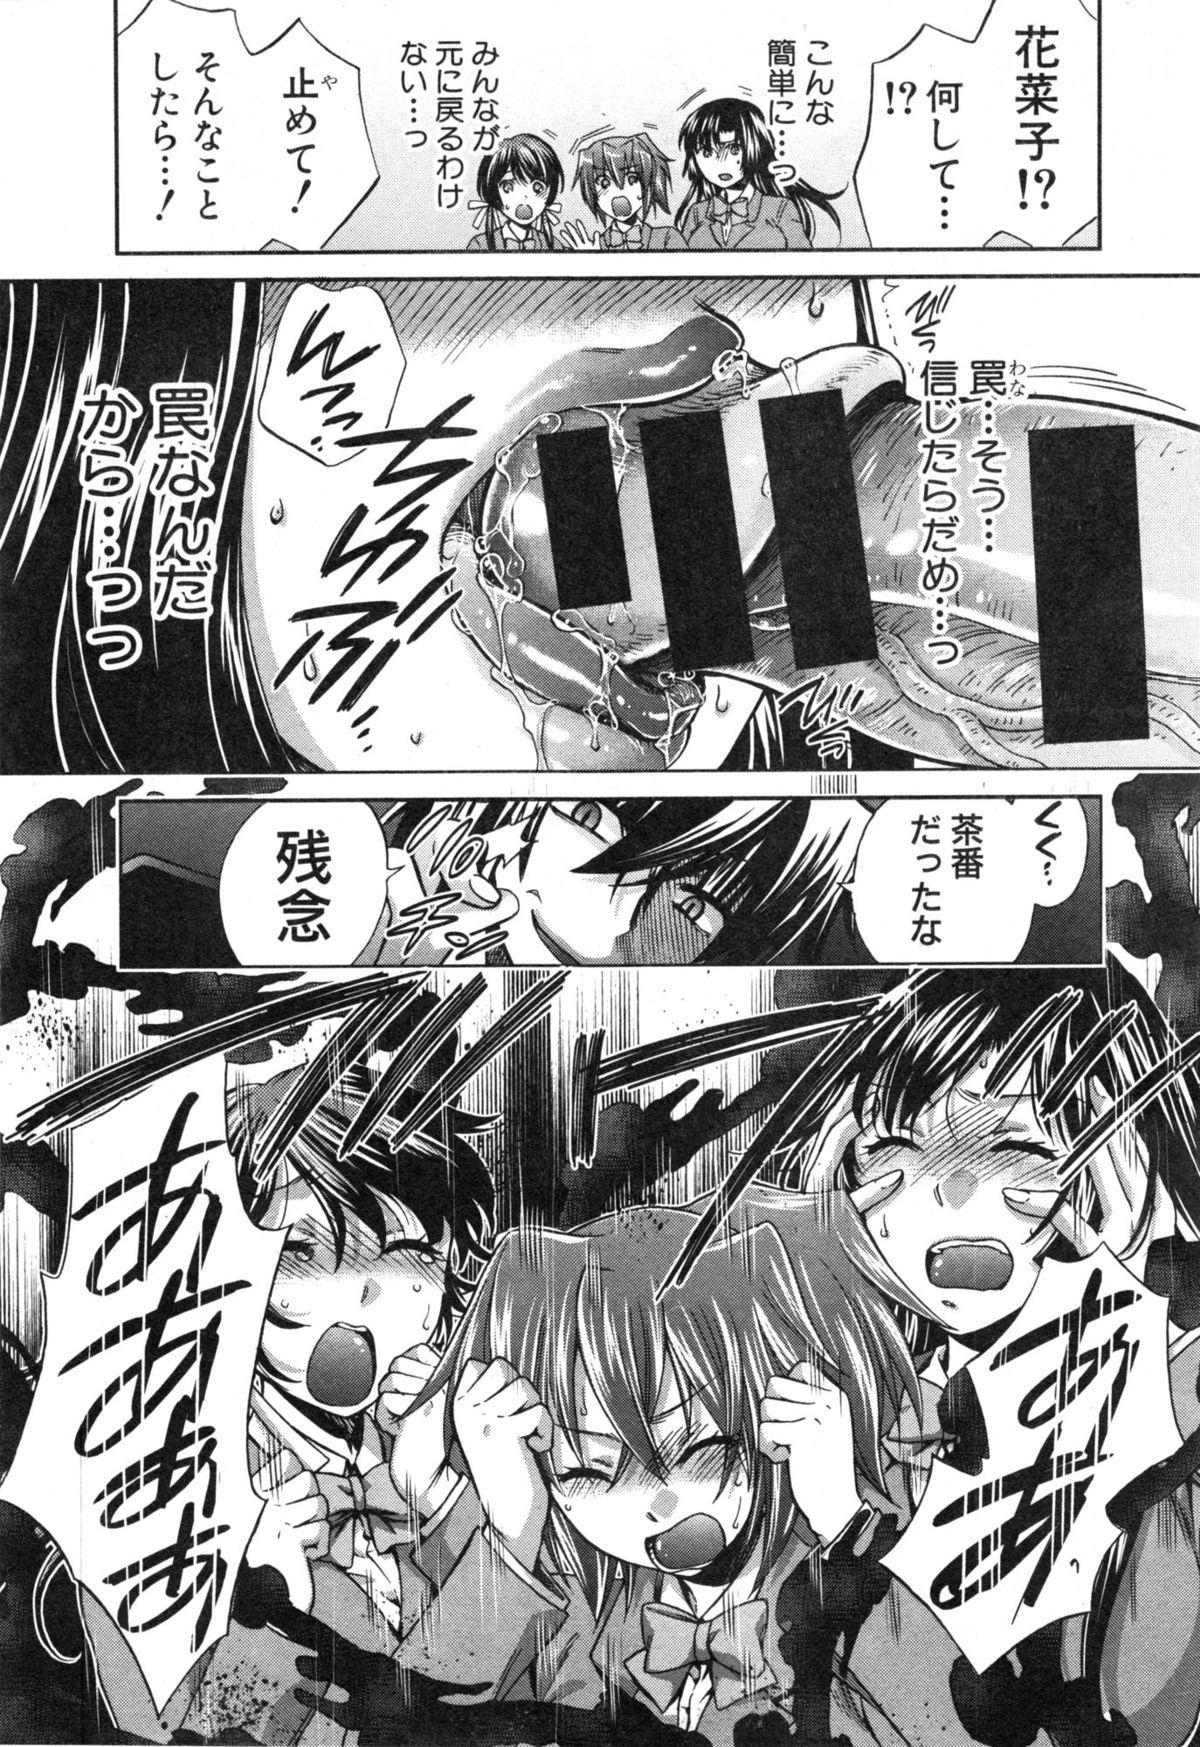 COMIC Shingeki 2015-01 144